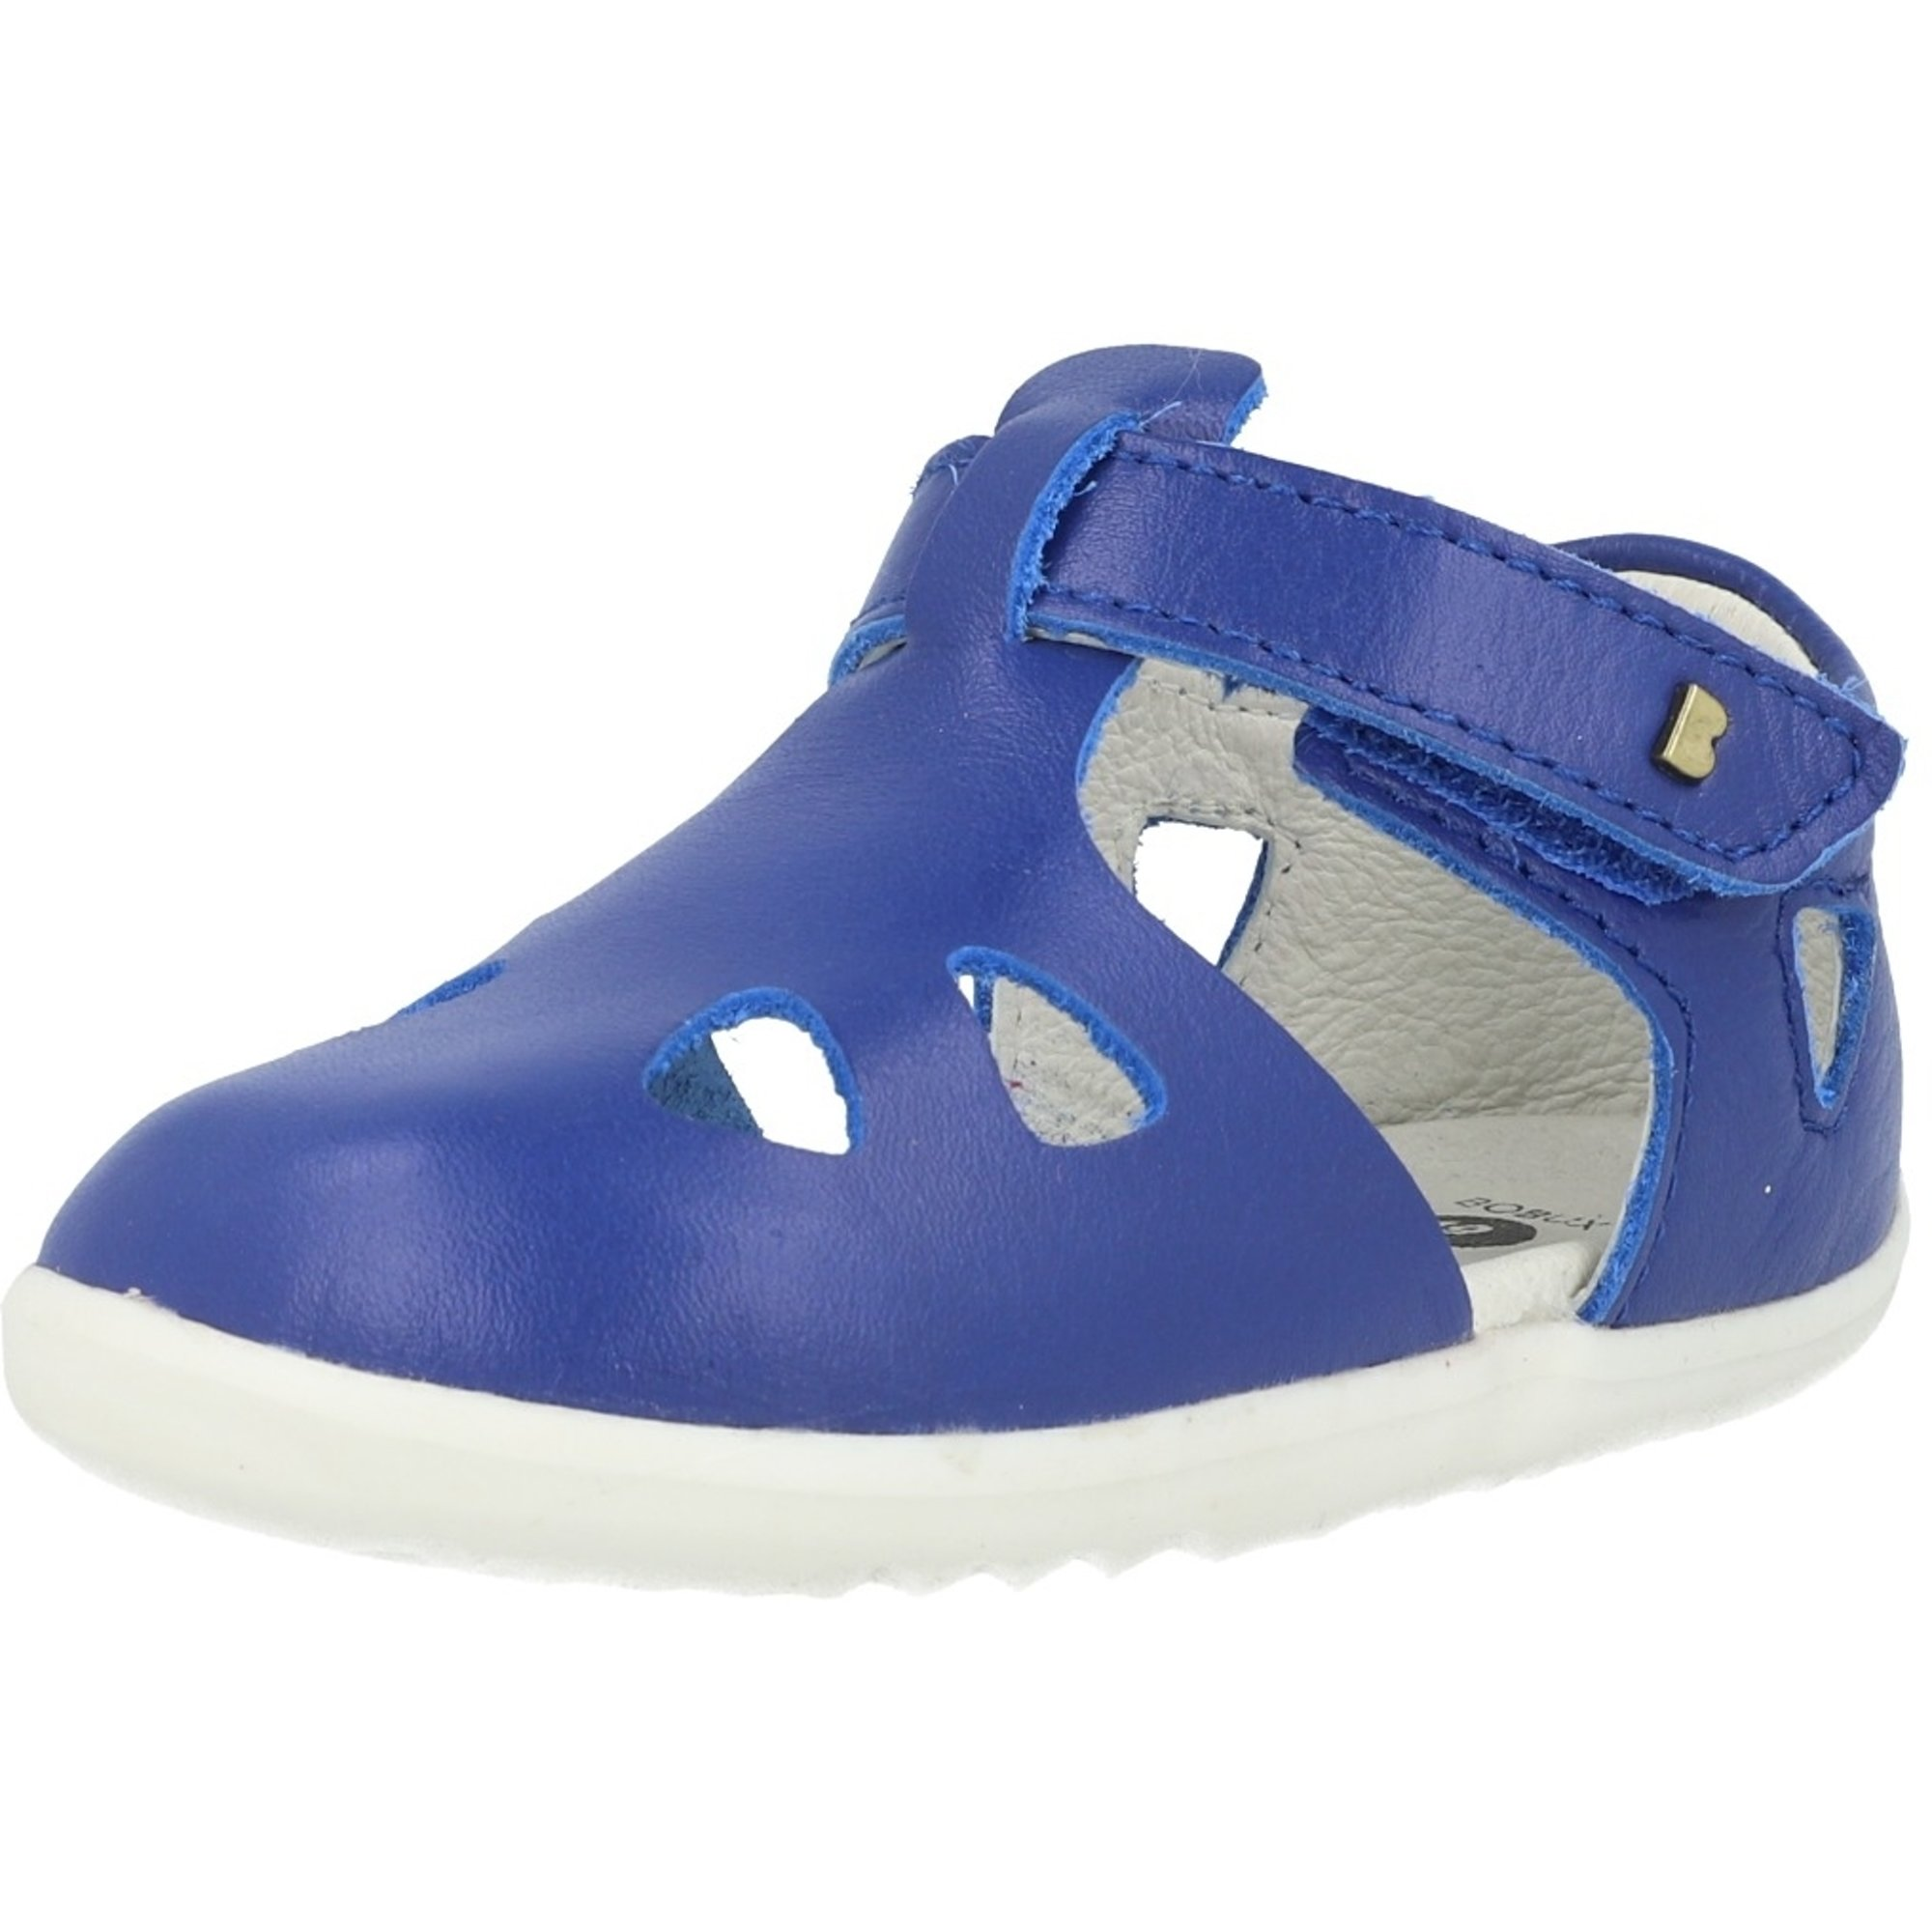 Bobux Step-Up Zap Blueberry Leather